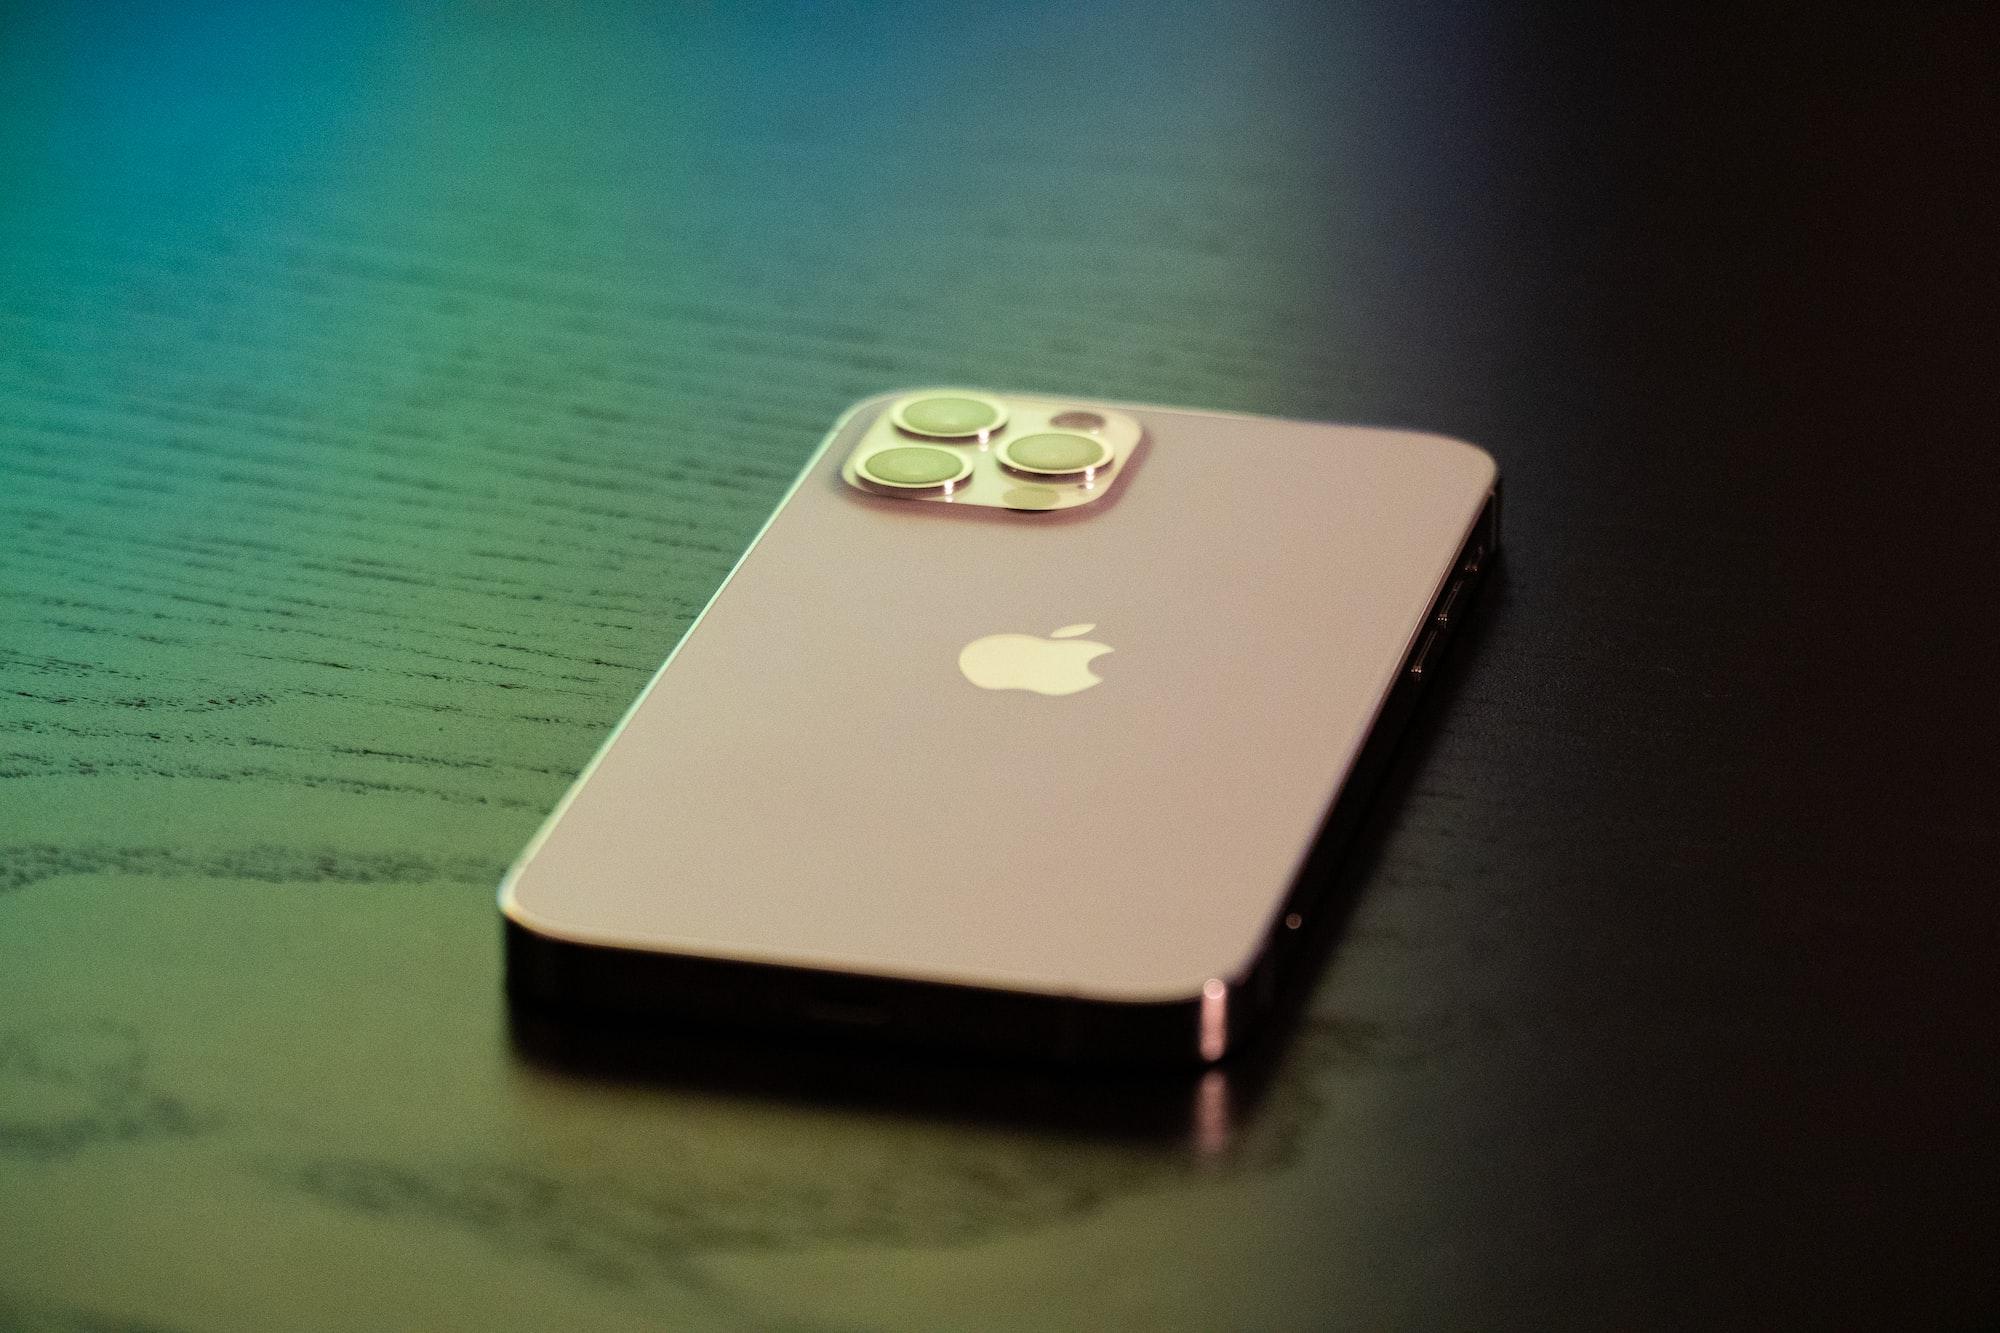 O iPhone 12 Pro Max pode ser a tua melhor escolha